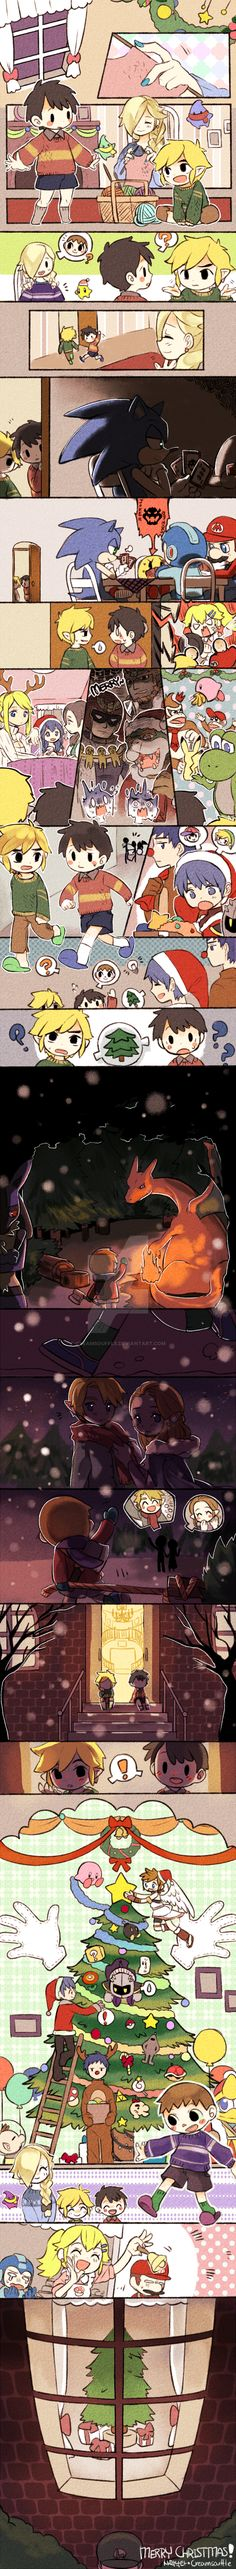 Super Smash Bros 4 - Merry Christmas! by Creamsouffle on DeviantArt